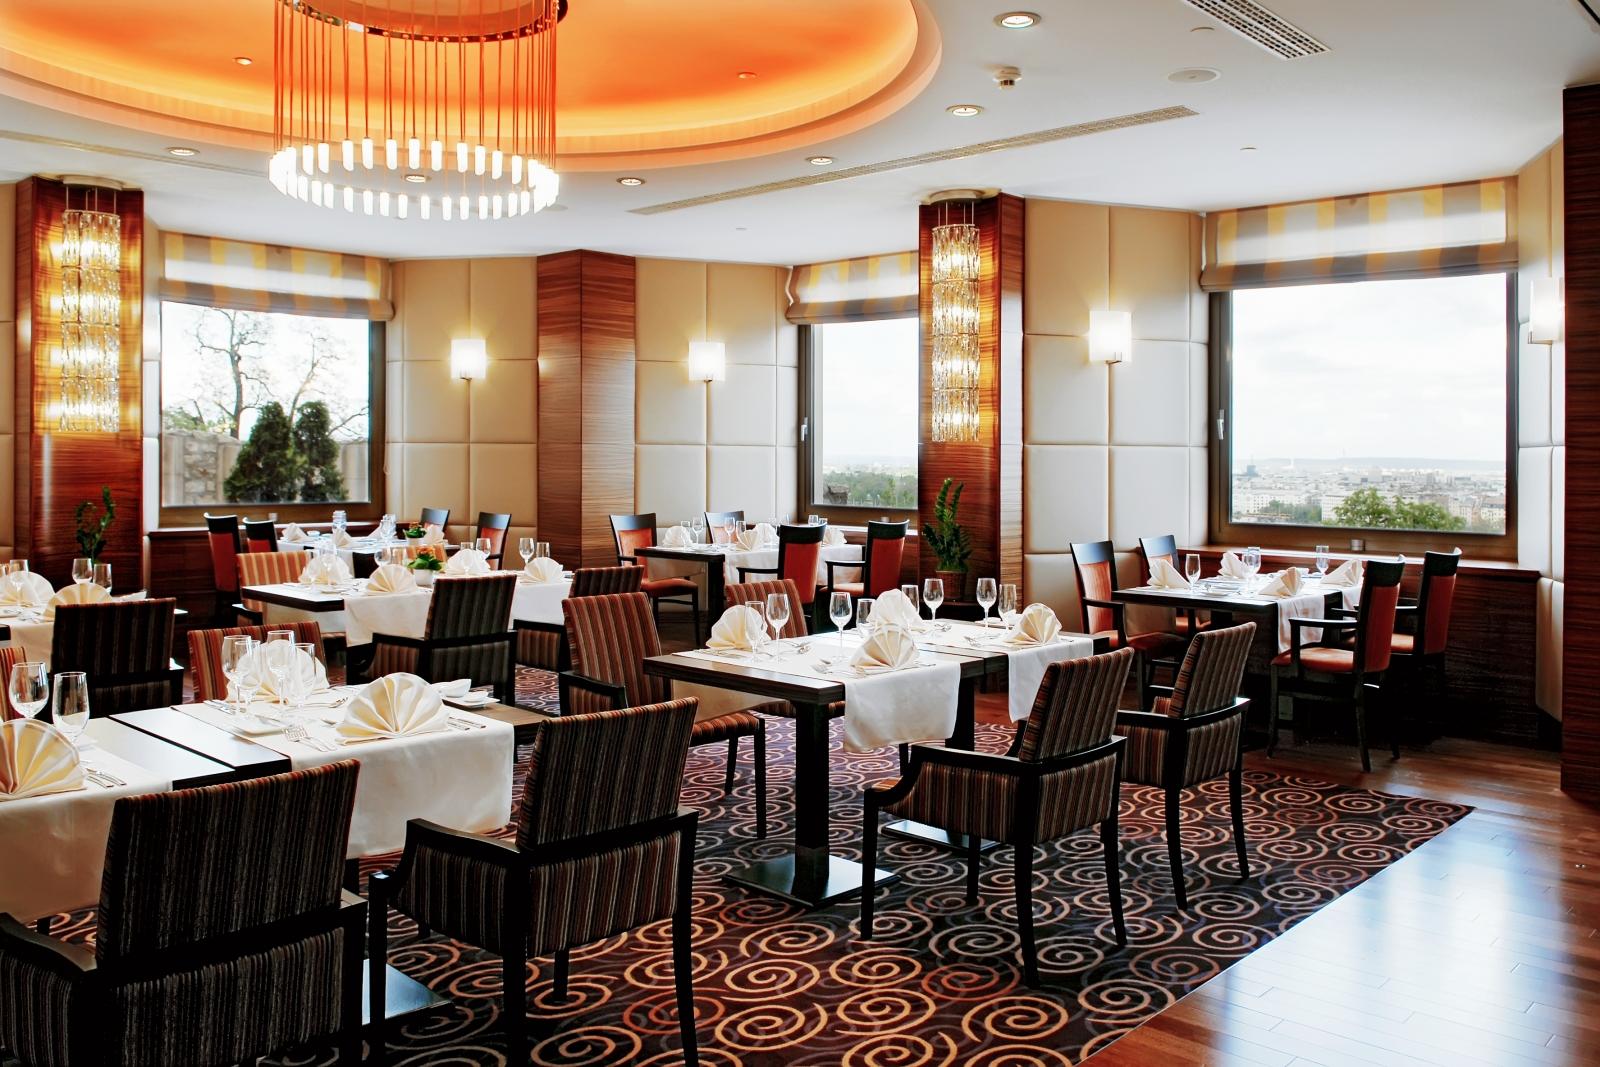 Hilton Budapest - ICON Etterem